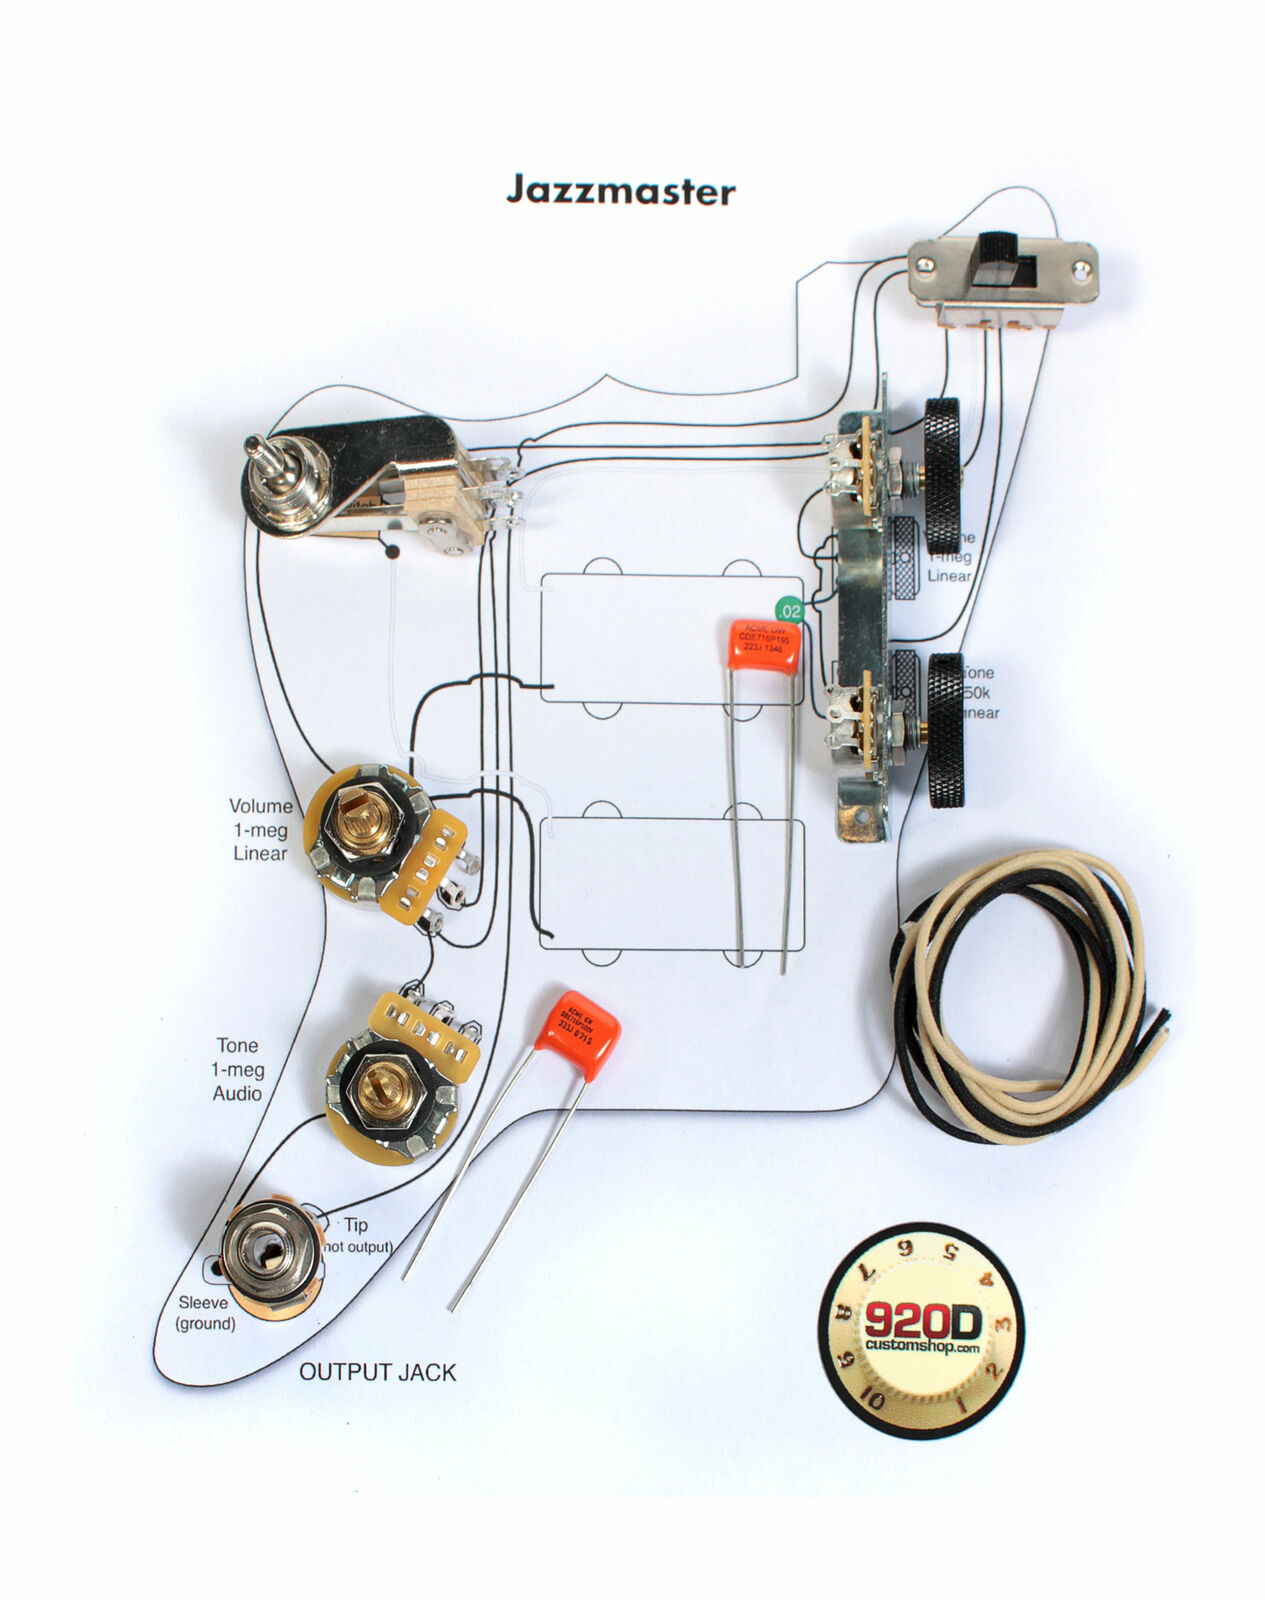 Fender Vintage Jazzmaster Wiring Kit - Pots Switch Slider Caps Bracket  Diagram for sale online   eBayeBay